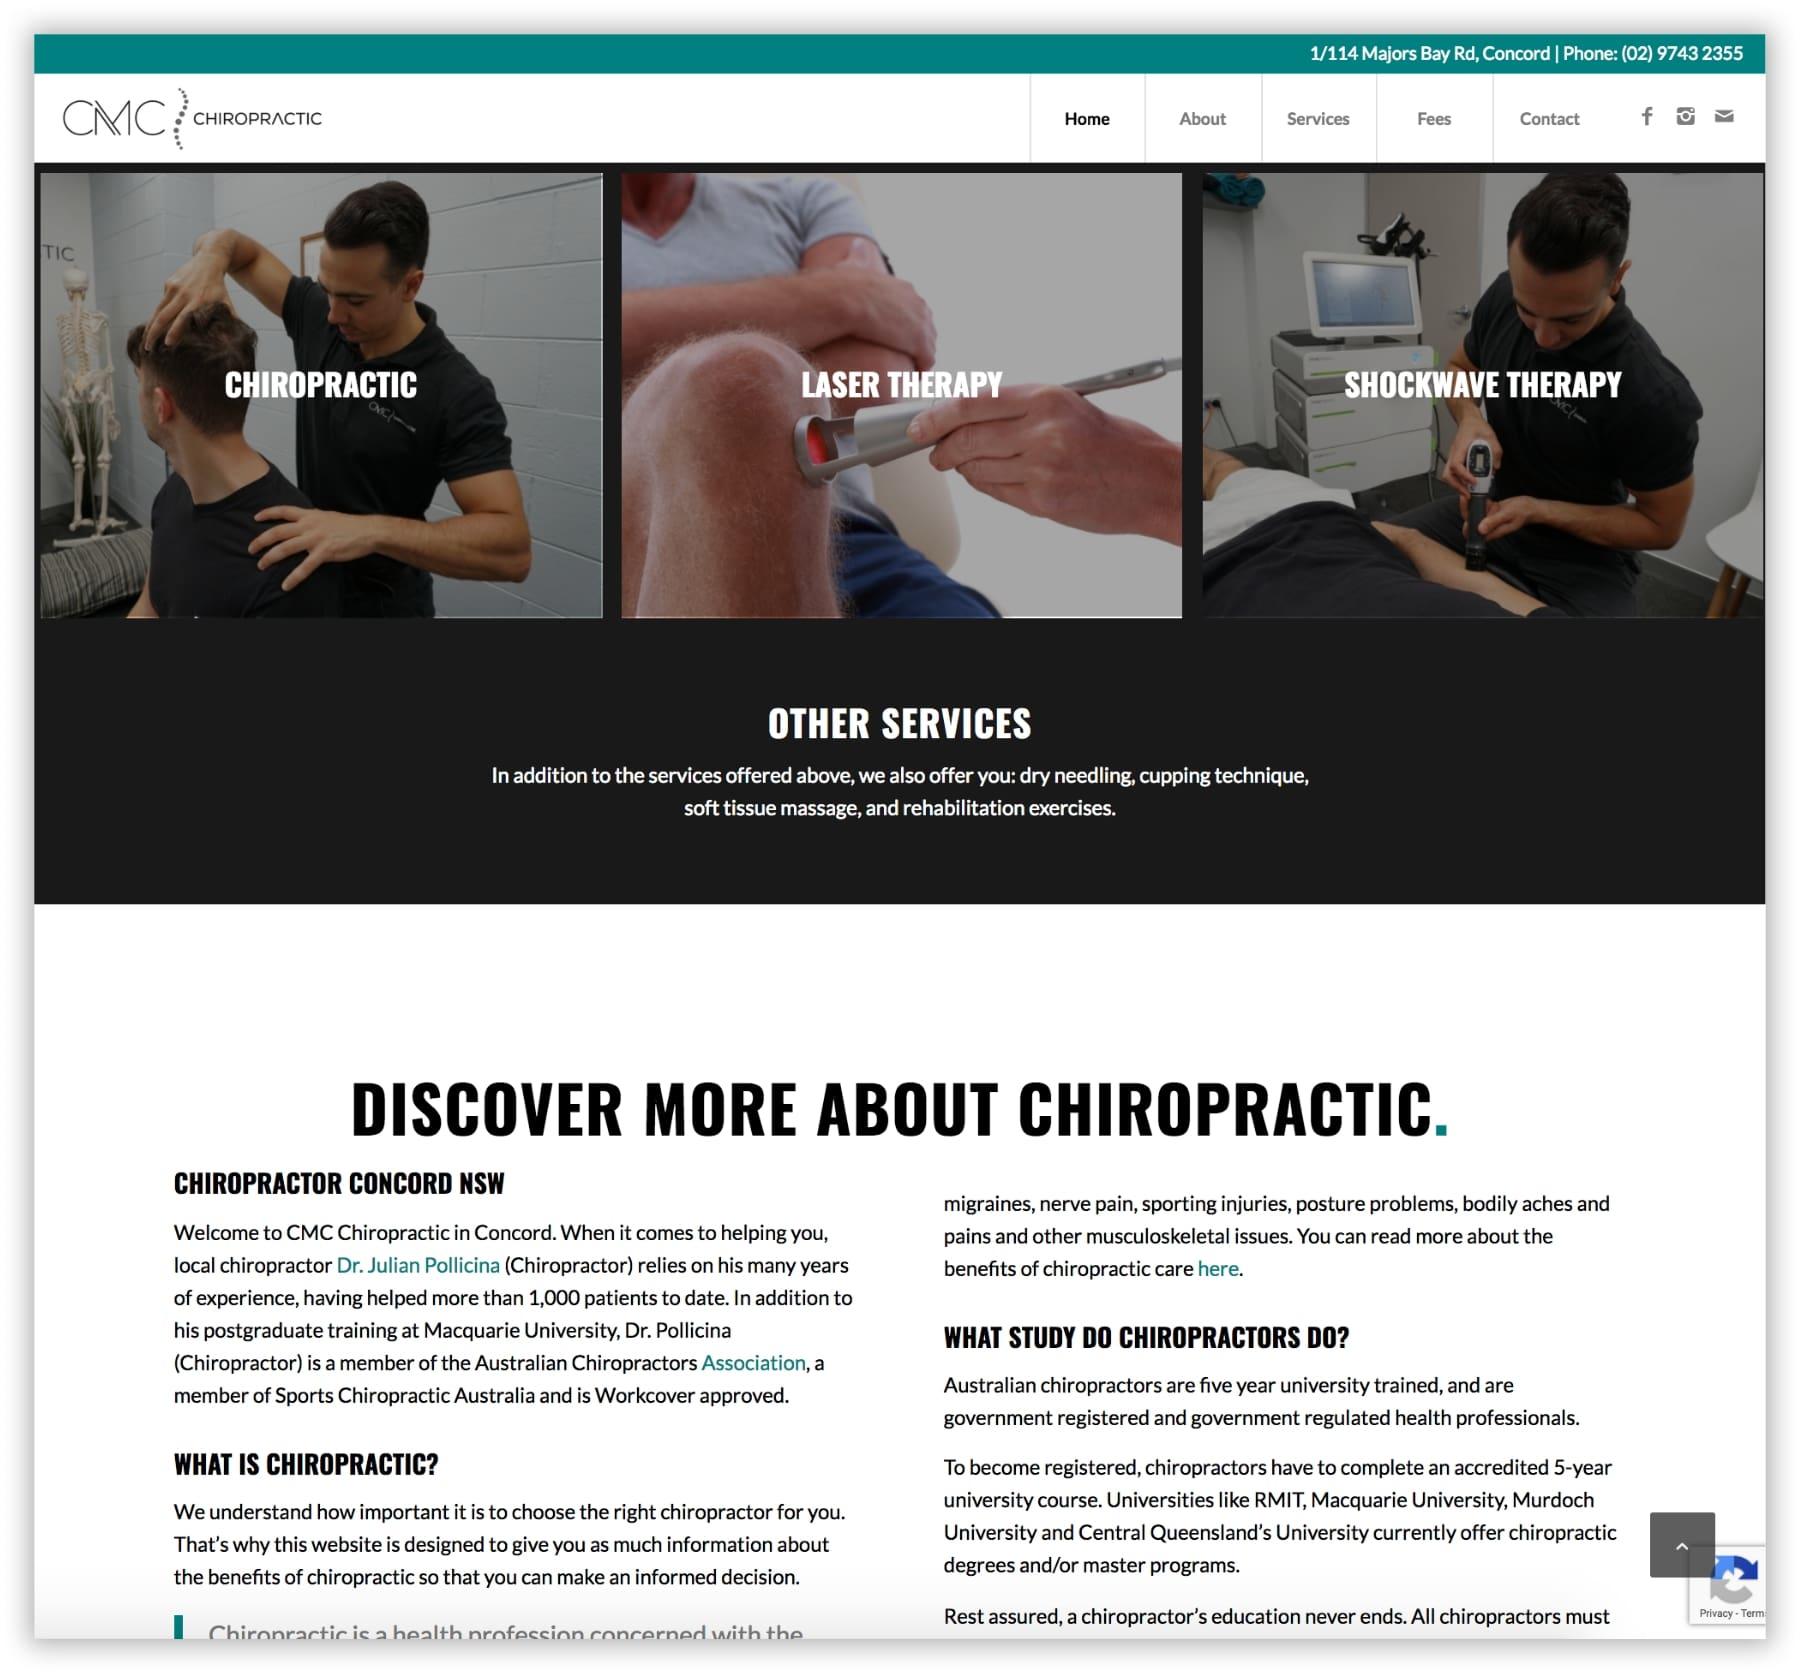 cmc-website-2